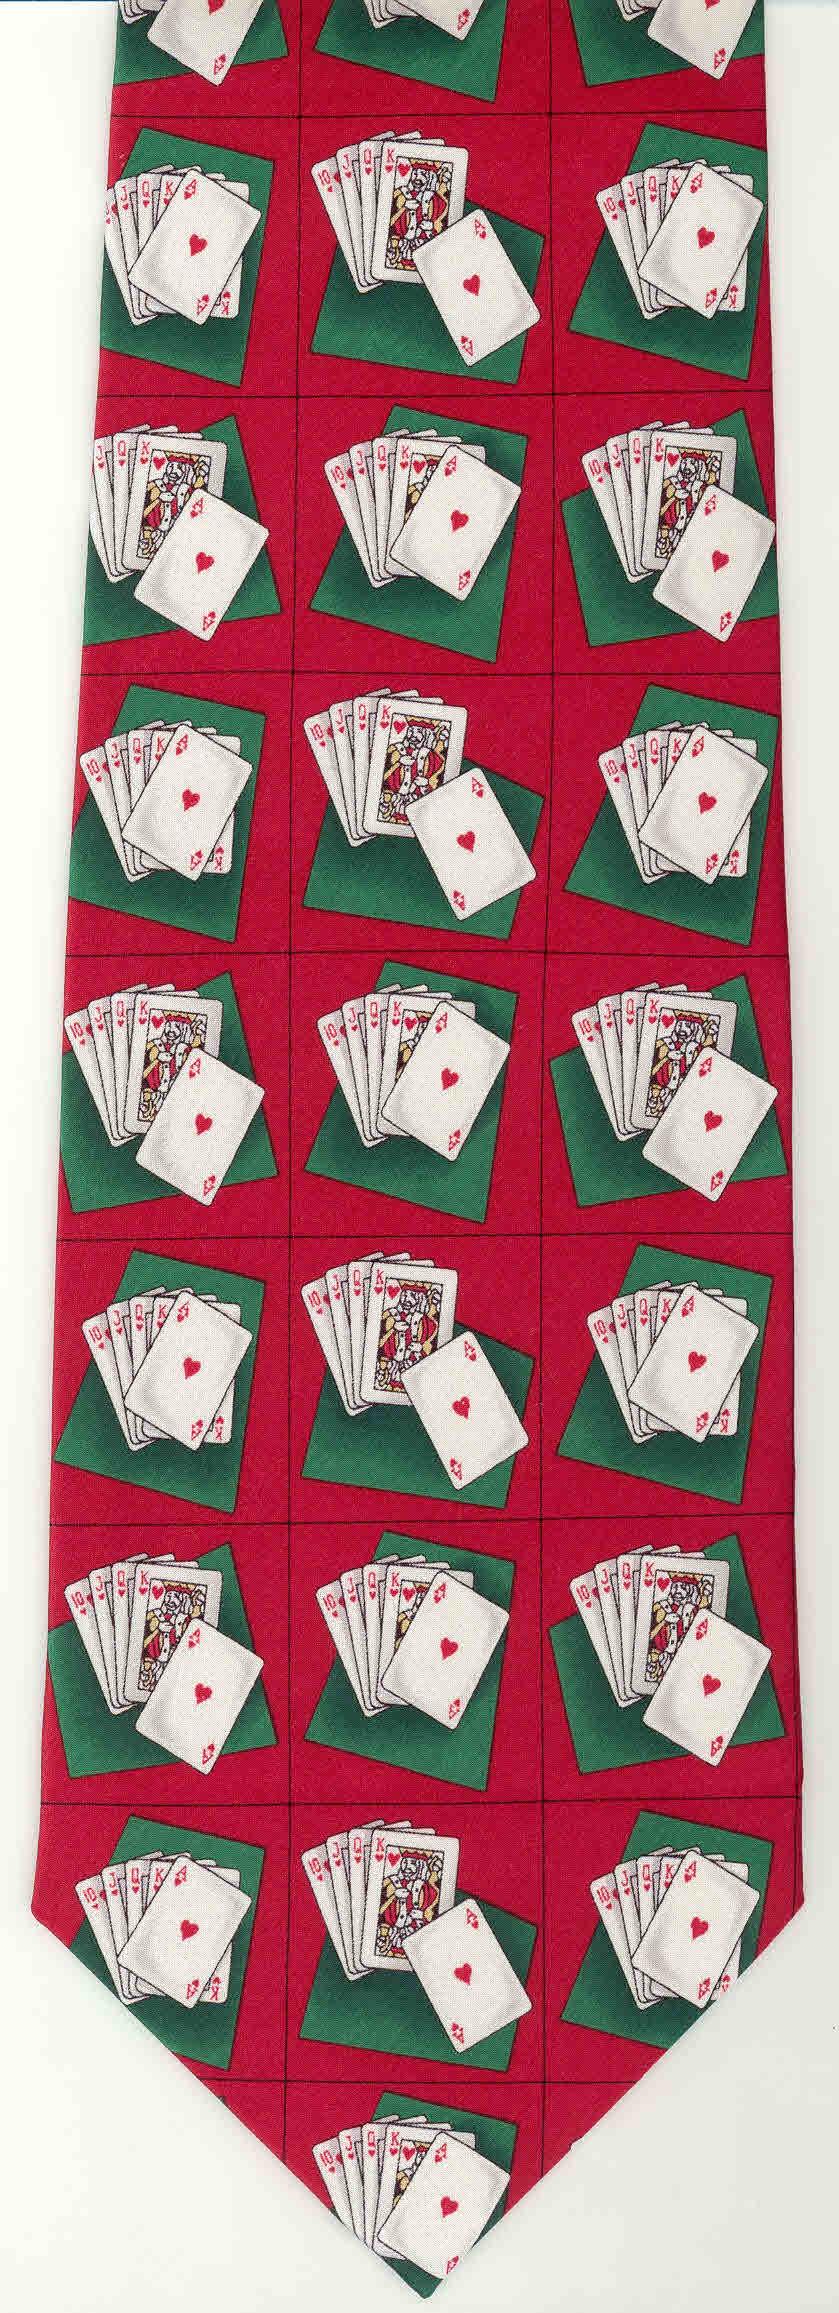 107 Red Poker Hands (XM).jpg